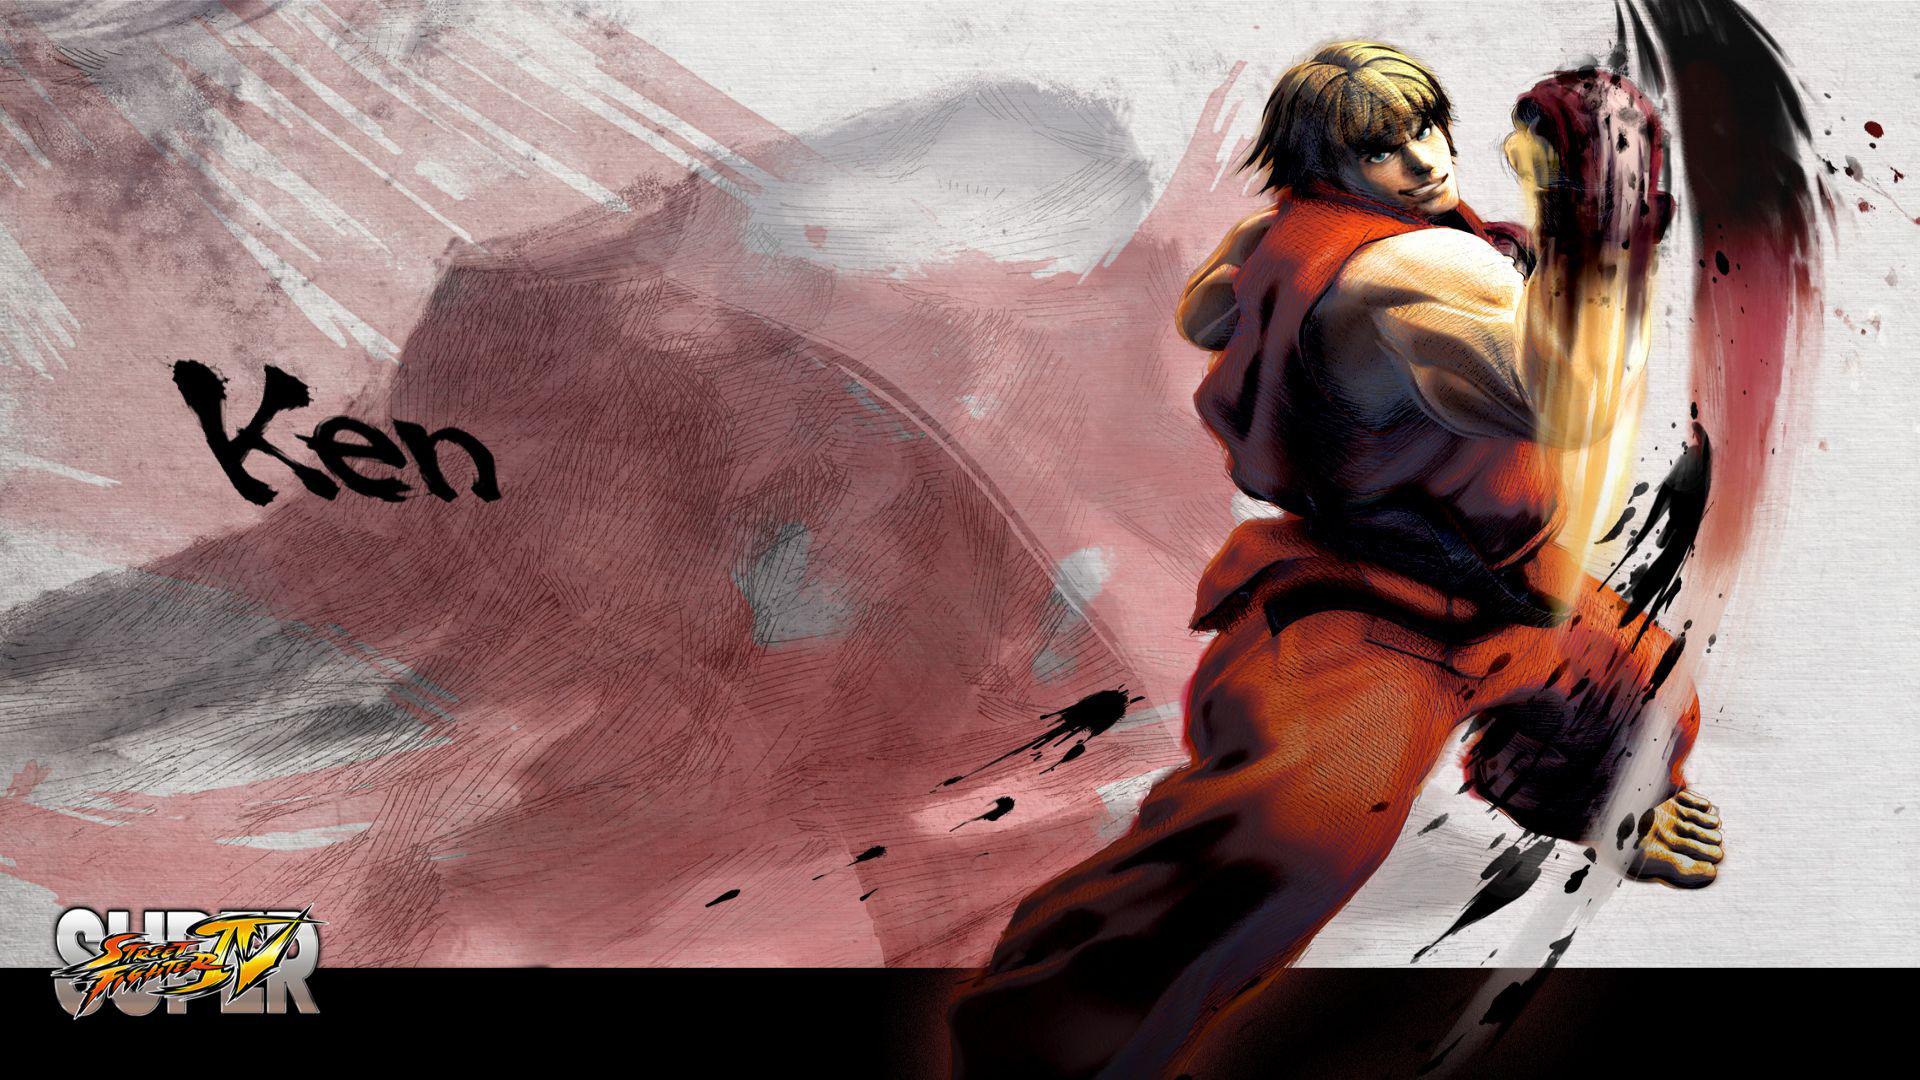 Street Fighter 5 Wallpaper: Wallpaper #27 Wallpaper From Ultra Street Fighter IV